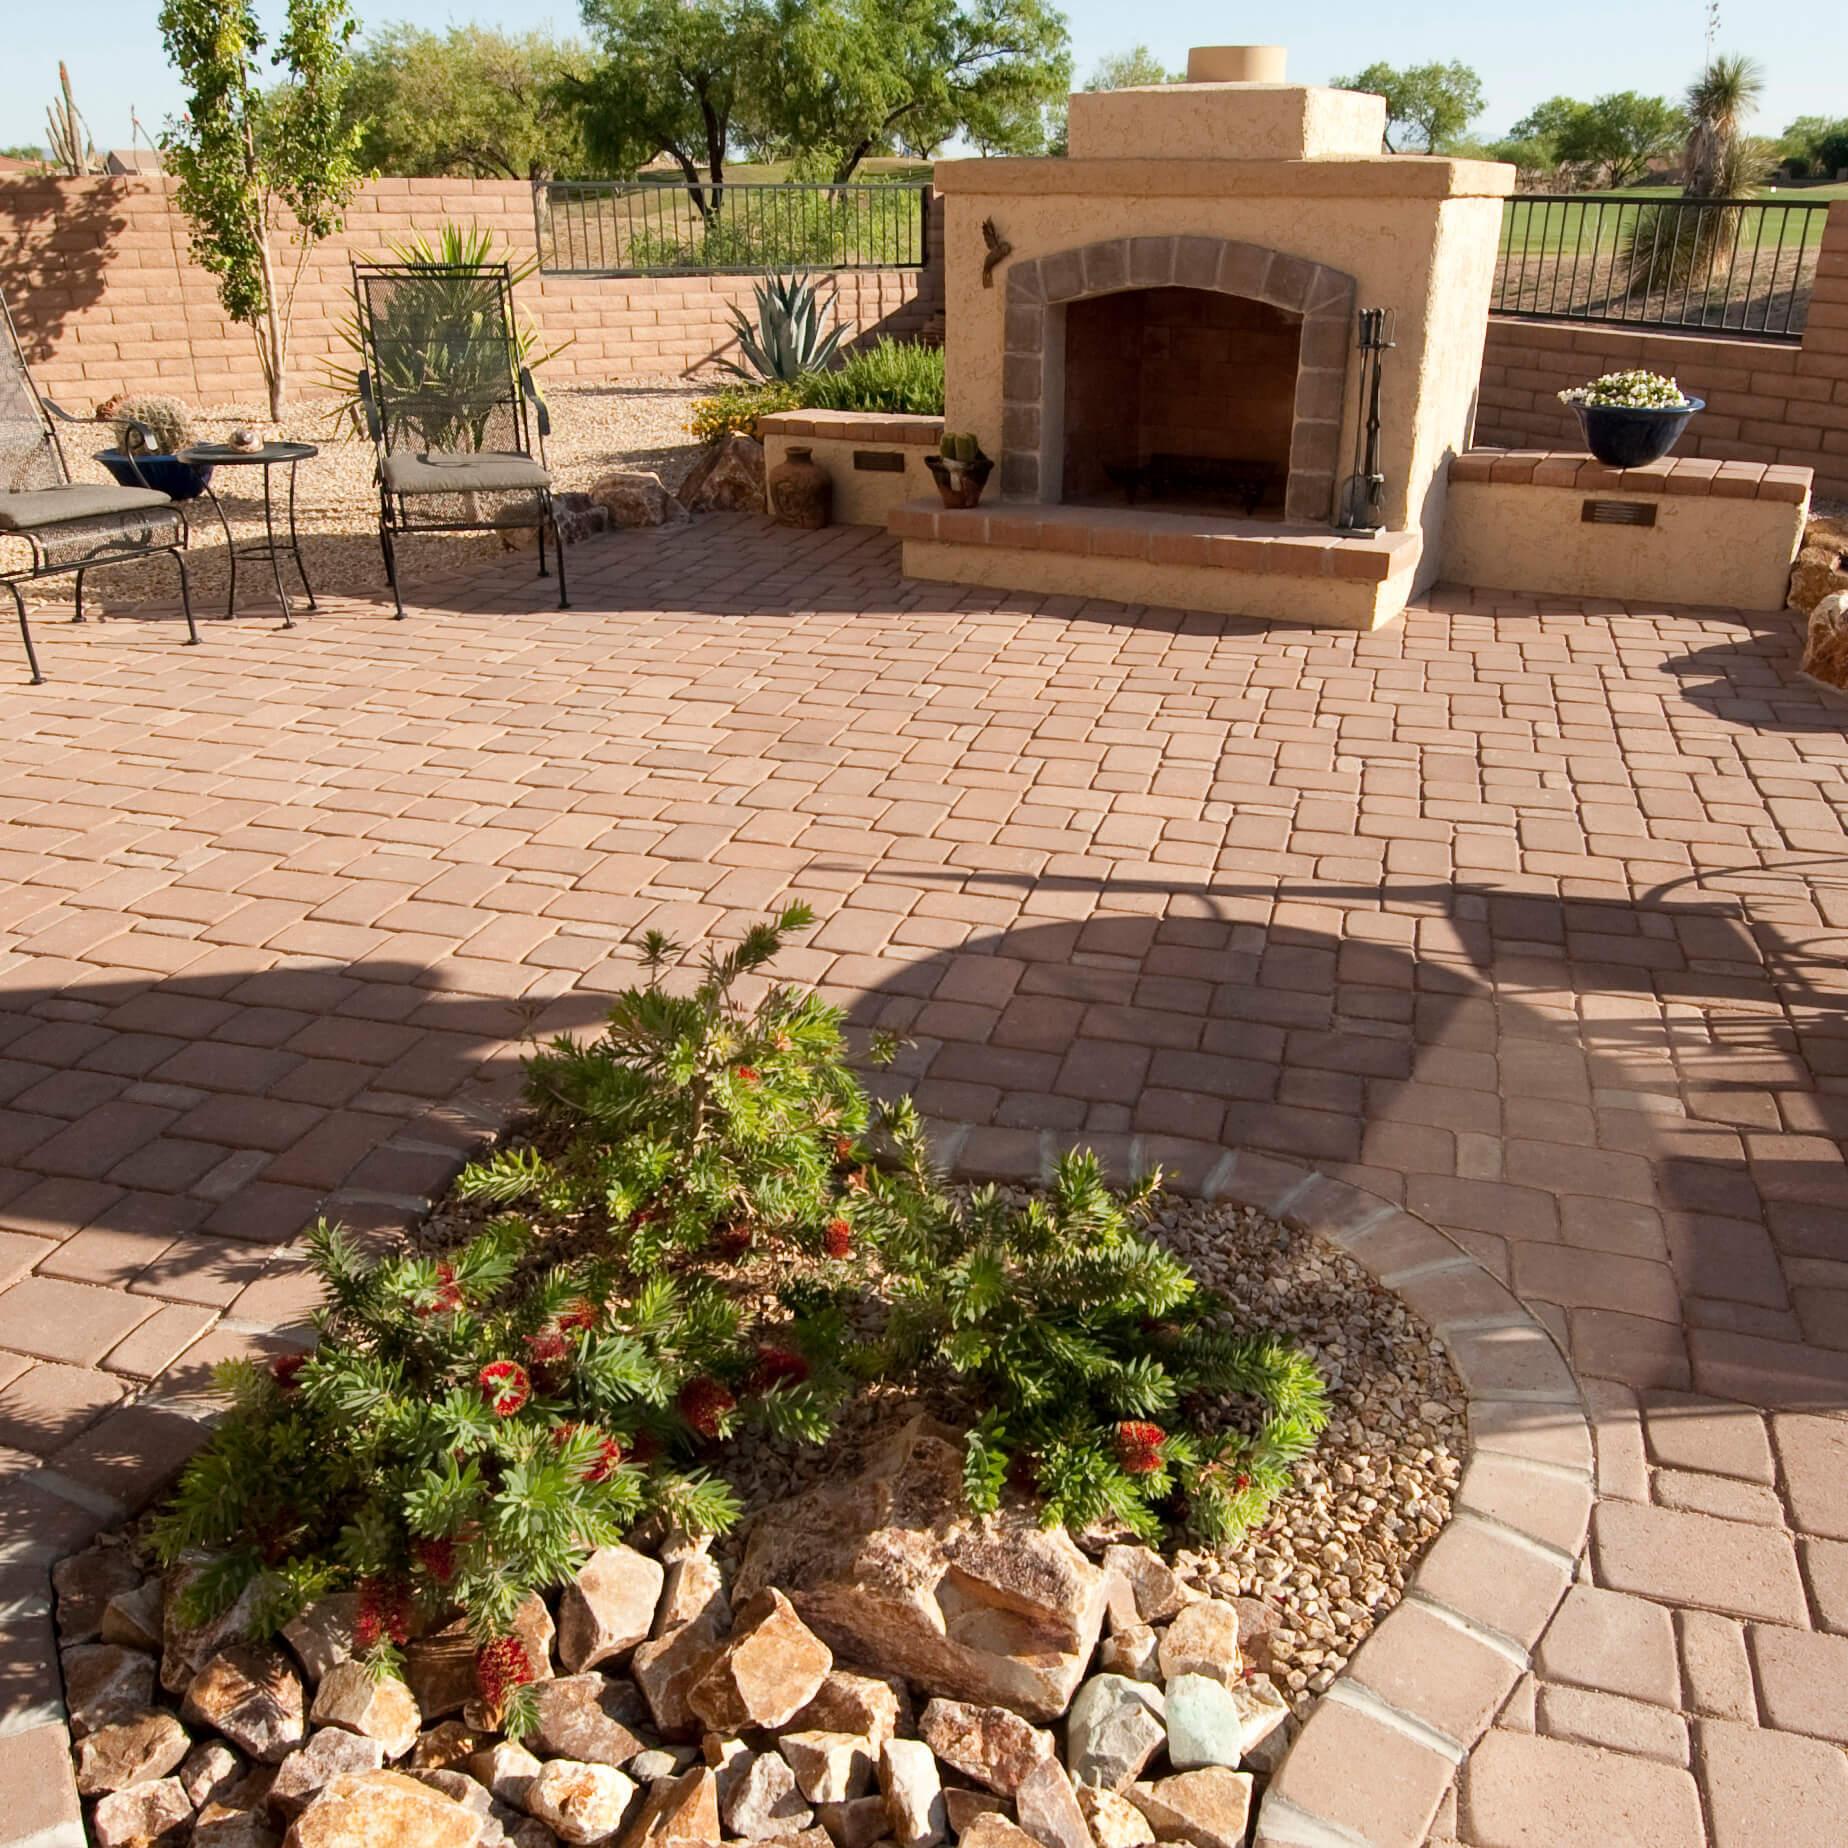 Low-Maintenance Landscape Ideas for Rental Properties | Tucson on Low Maintenance Backyard Design  id=83387